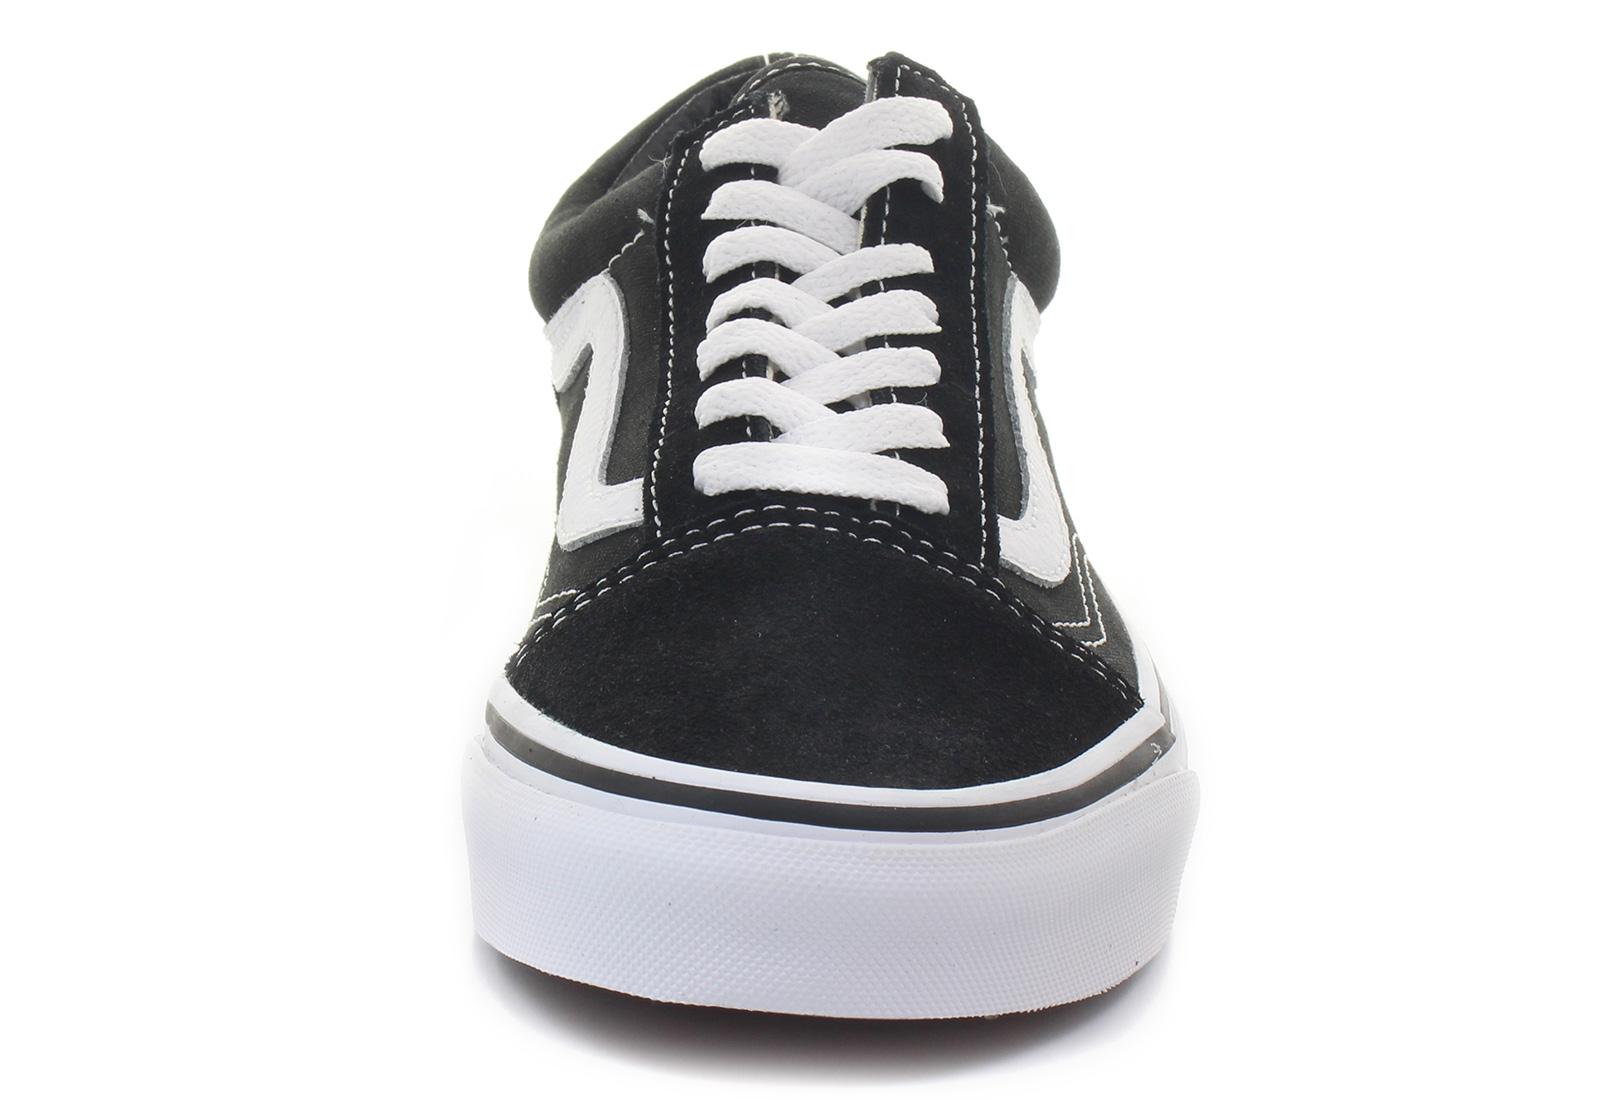 23564920da Vans Cipő - Ua Old Skool - VD3H-Y28 - Office Shoes Magyarország